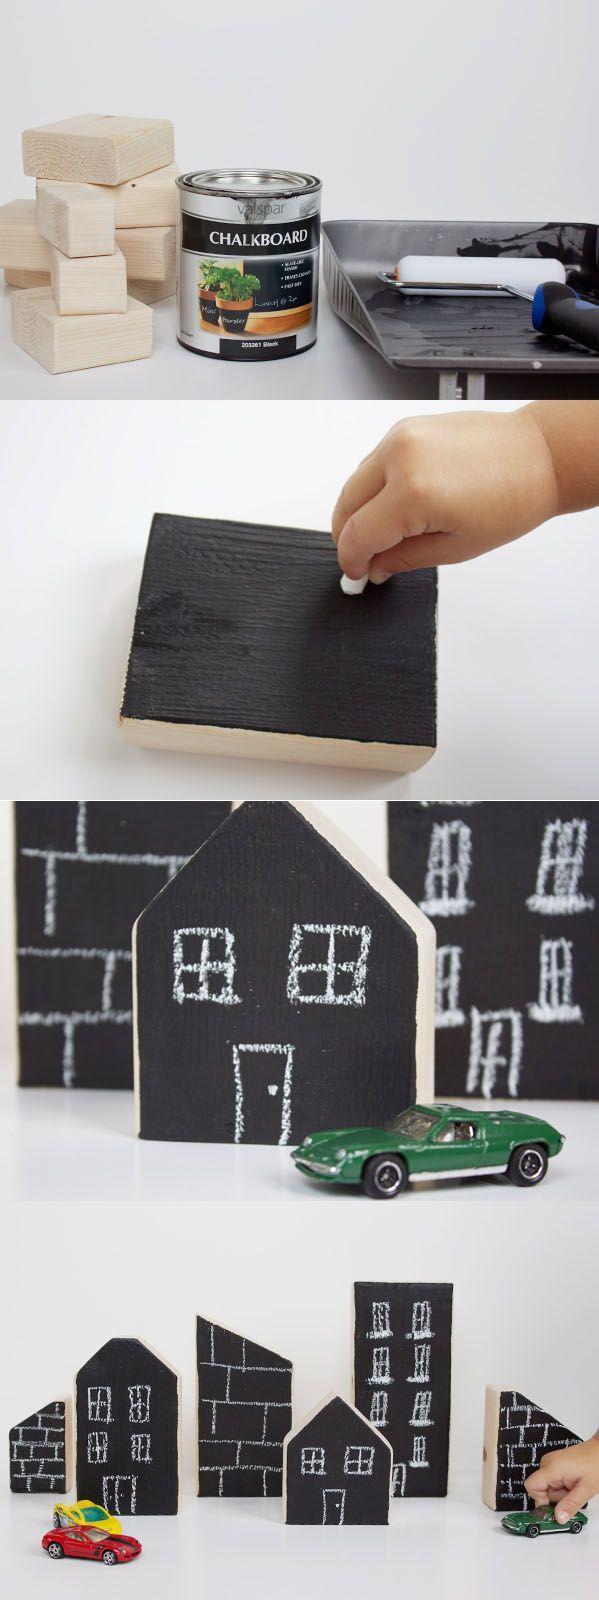 chalkboard city blocks - DIY toy for kids